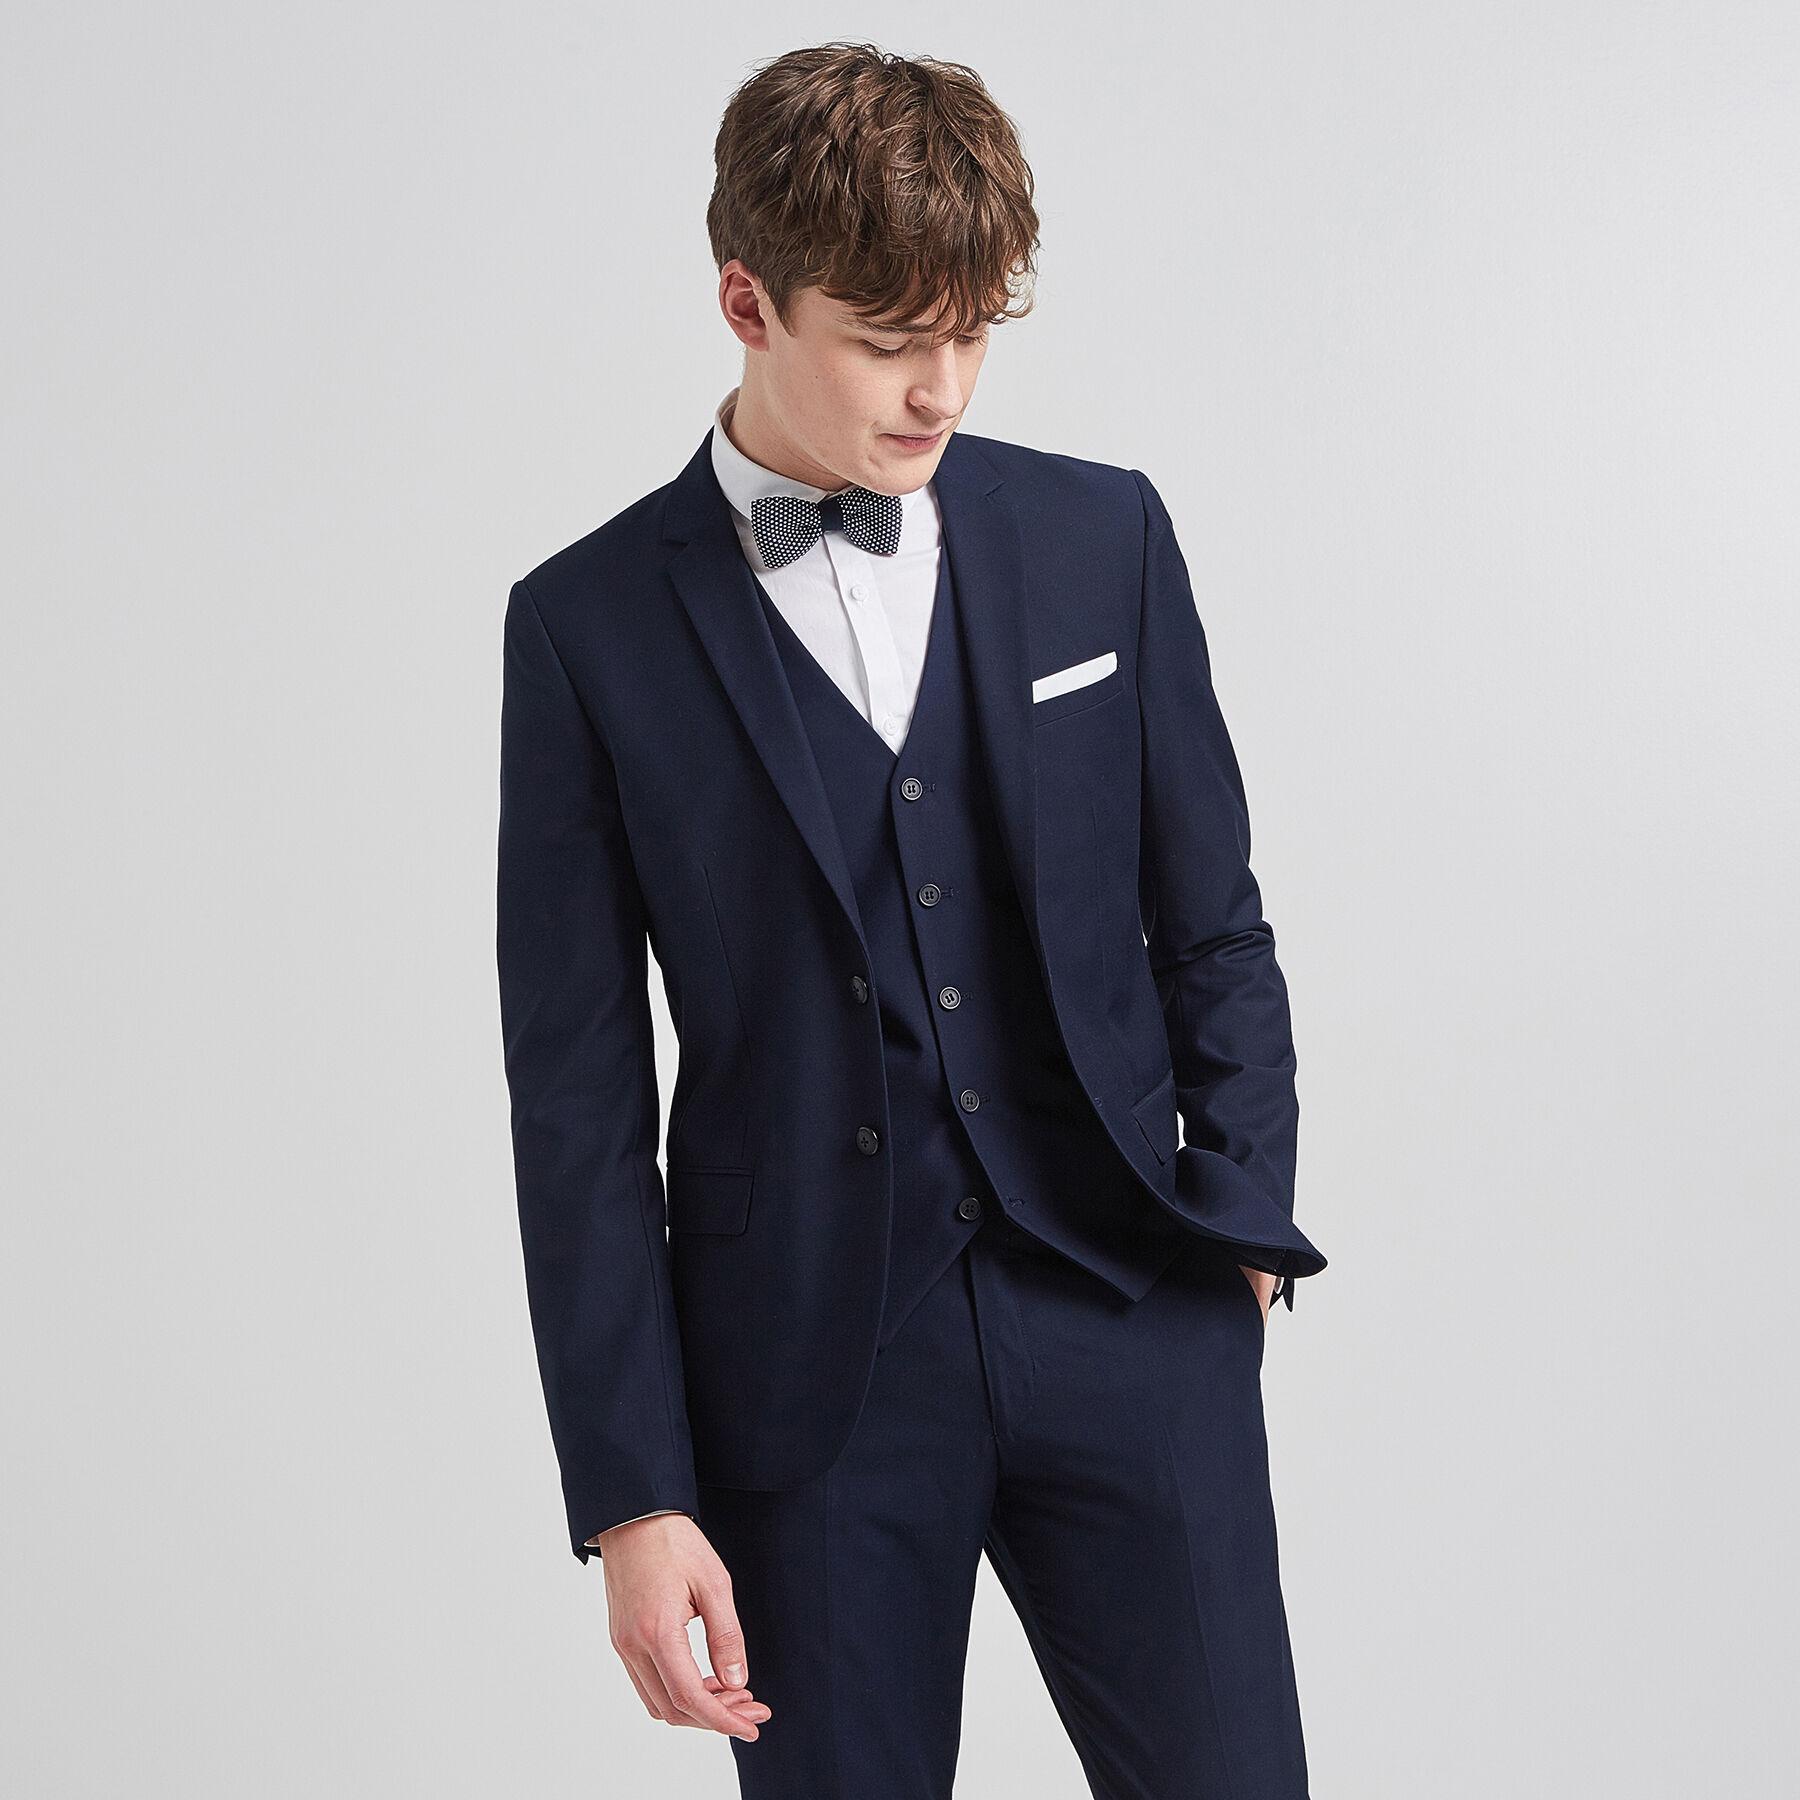 Veste classe homme bleu marine